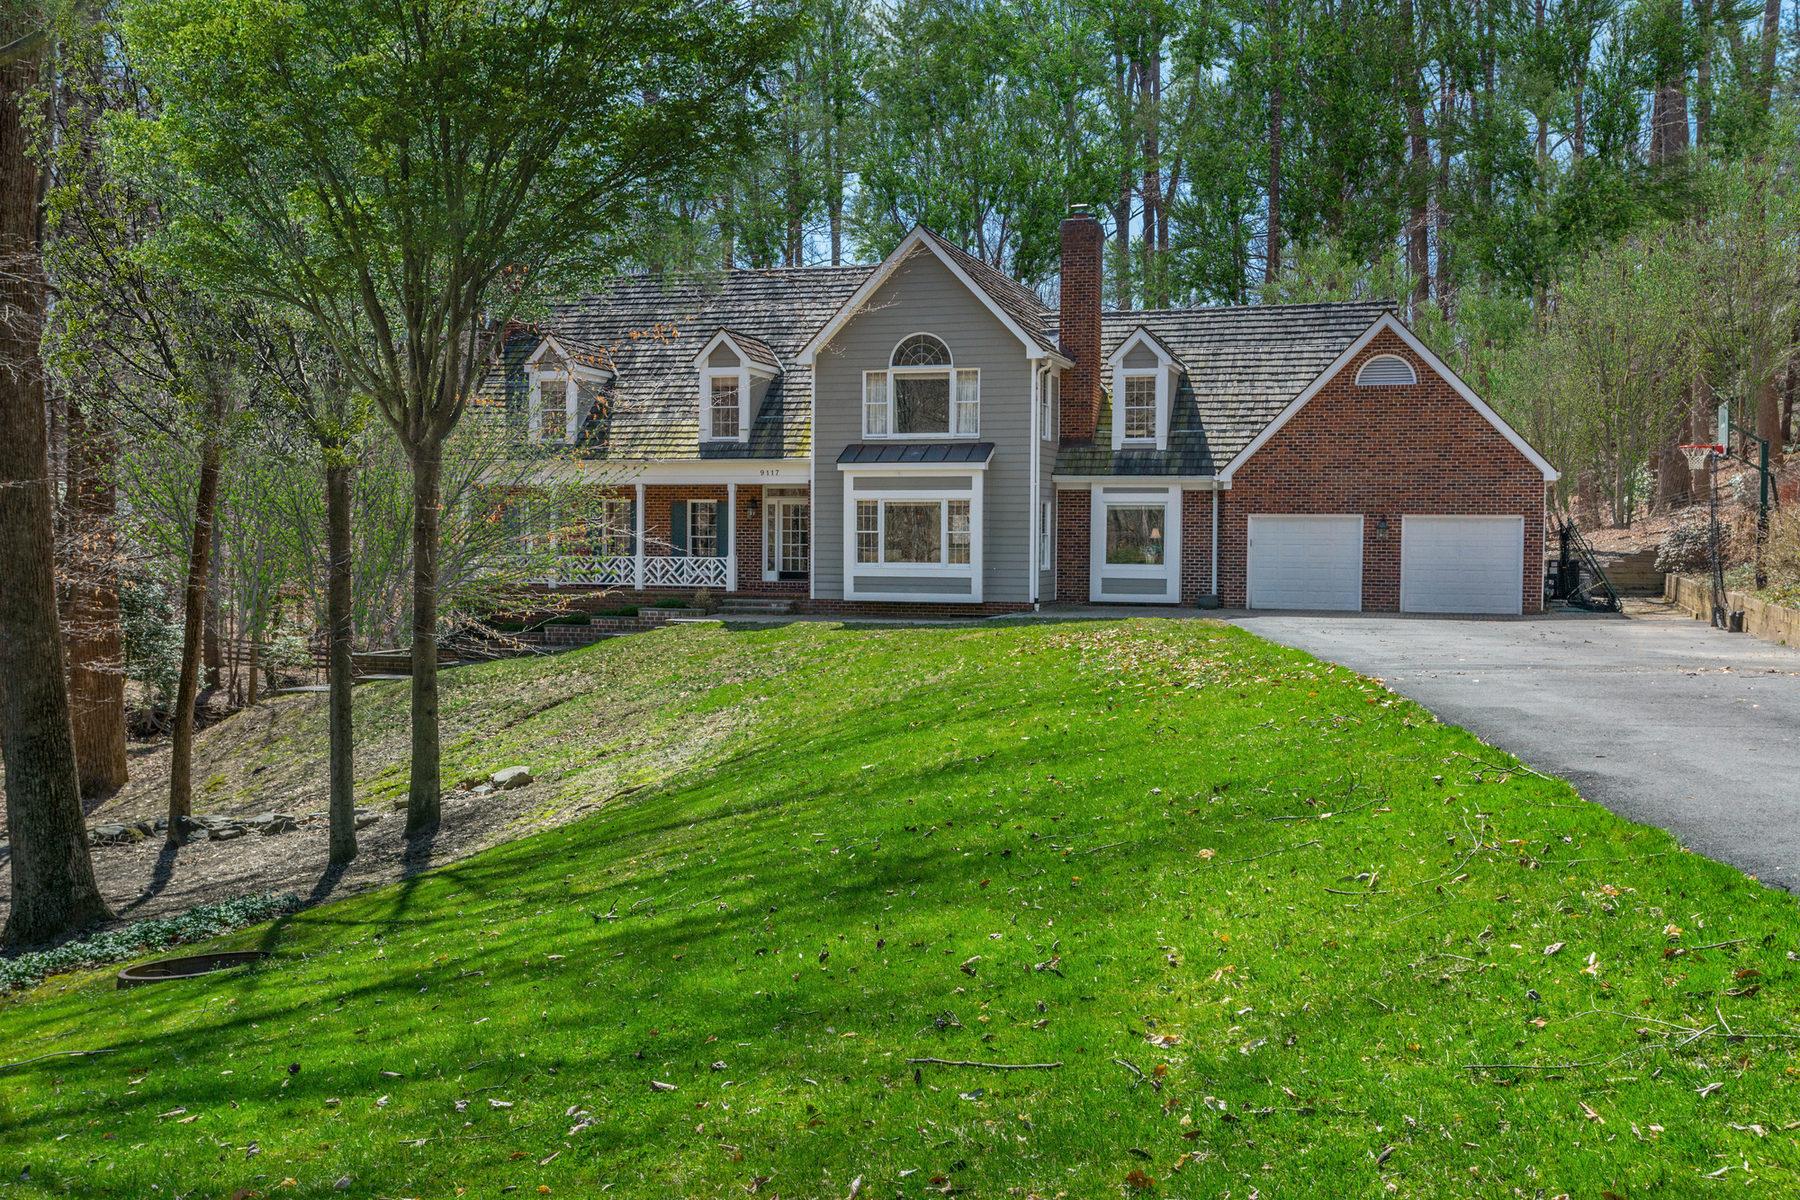 獨棟家庭住宅 為 出售 在 9117 Maria Avenue, Great Falls Great Falls, 弗吉尼亞州 22066 美國